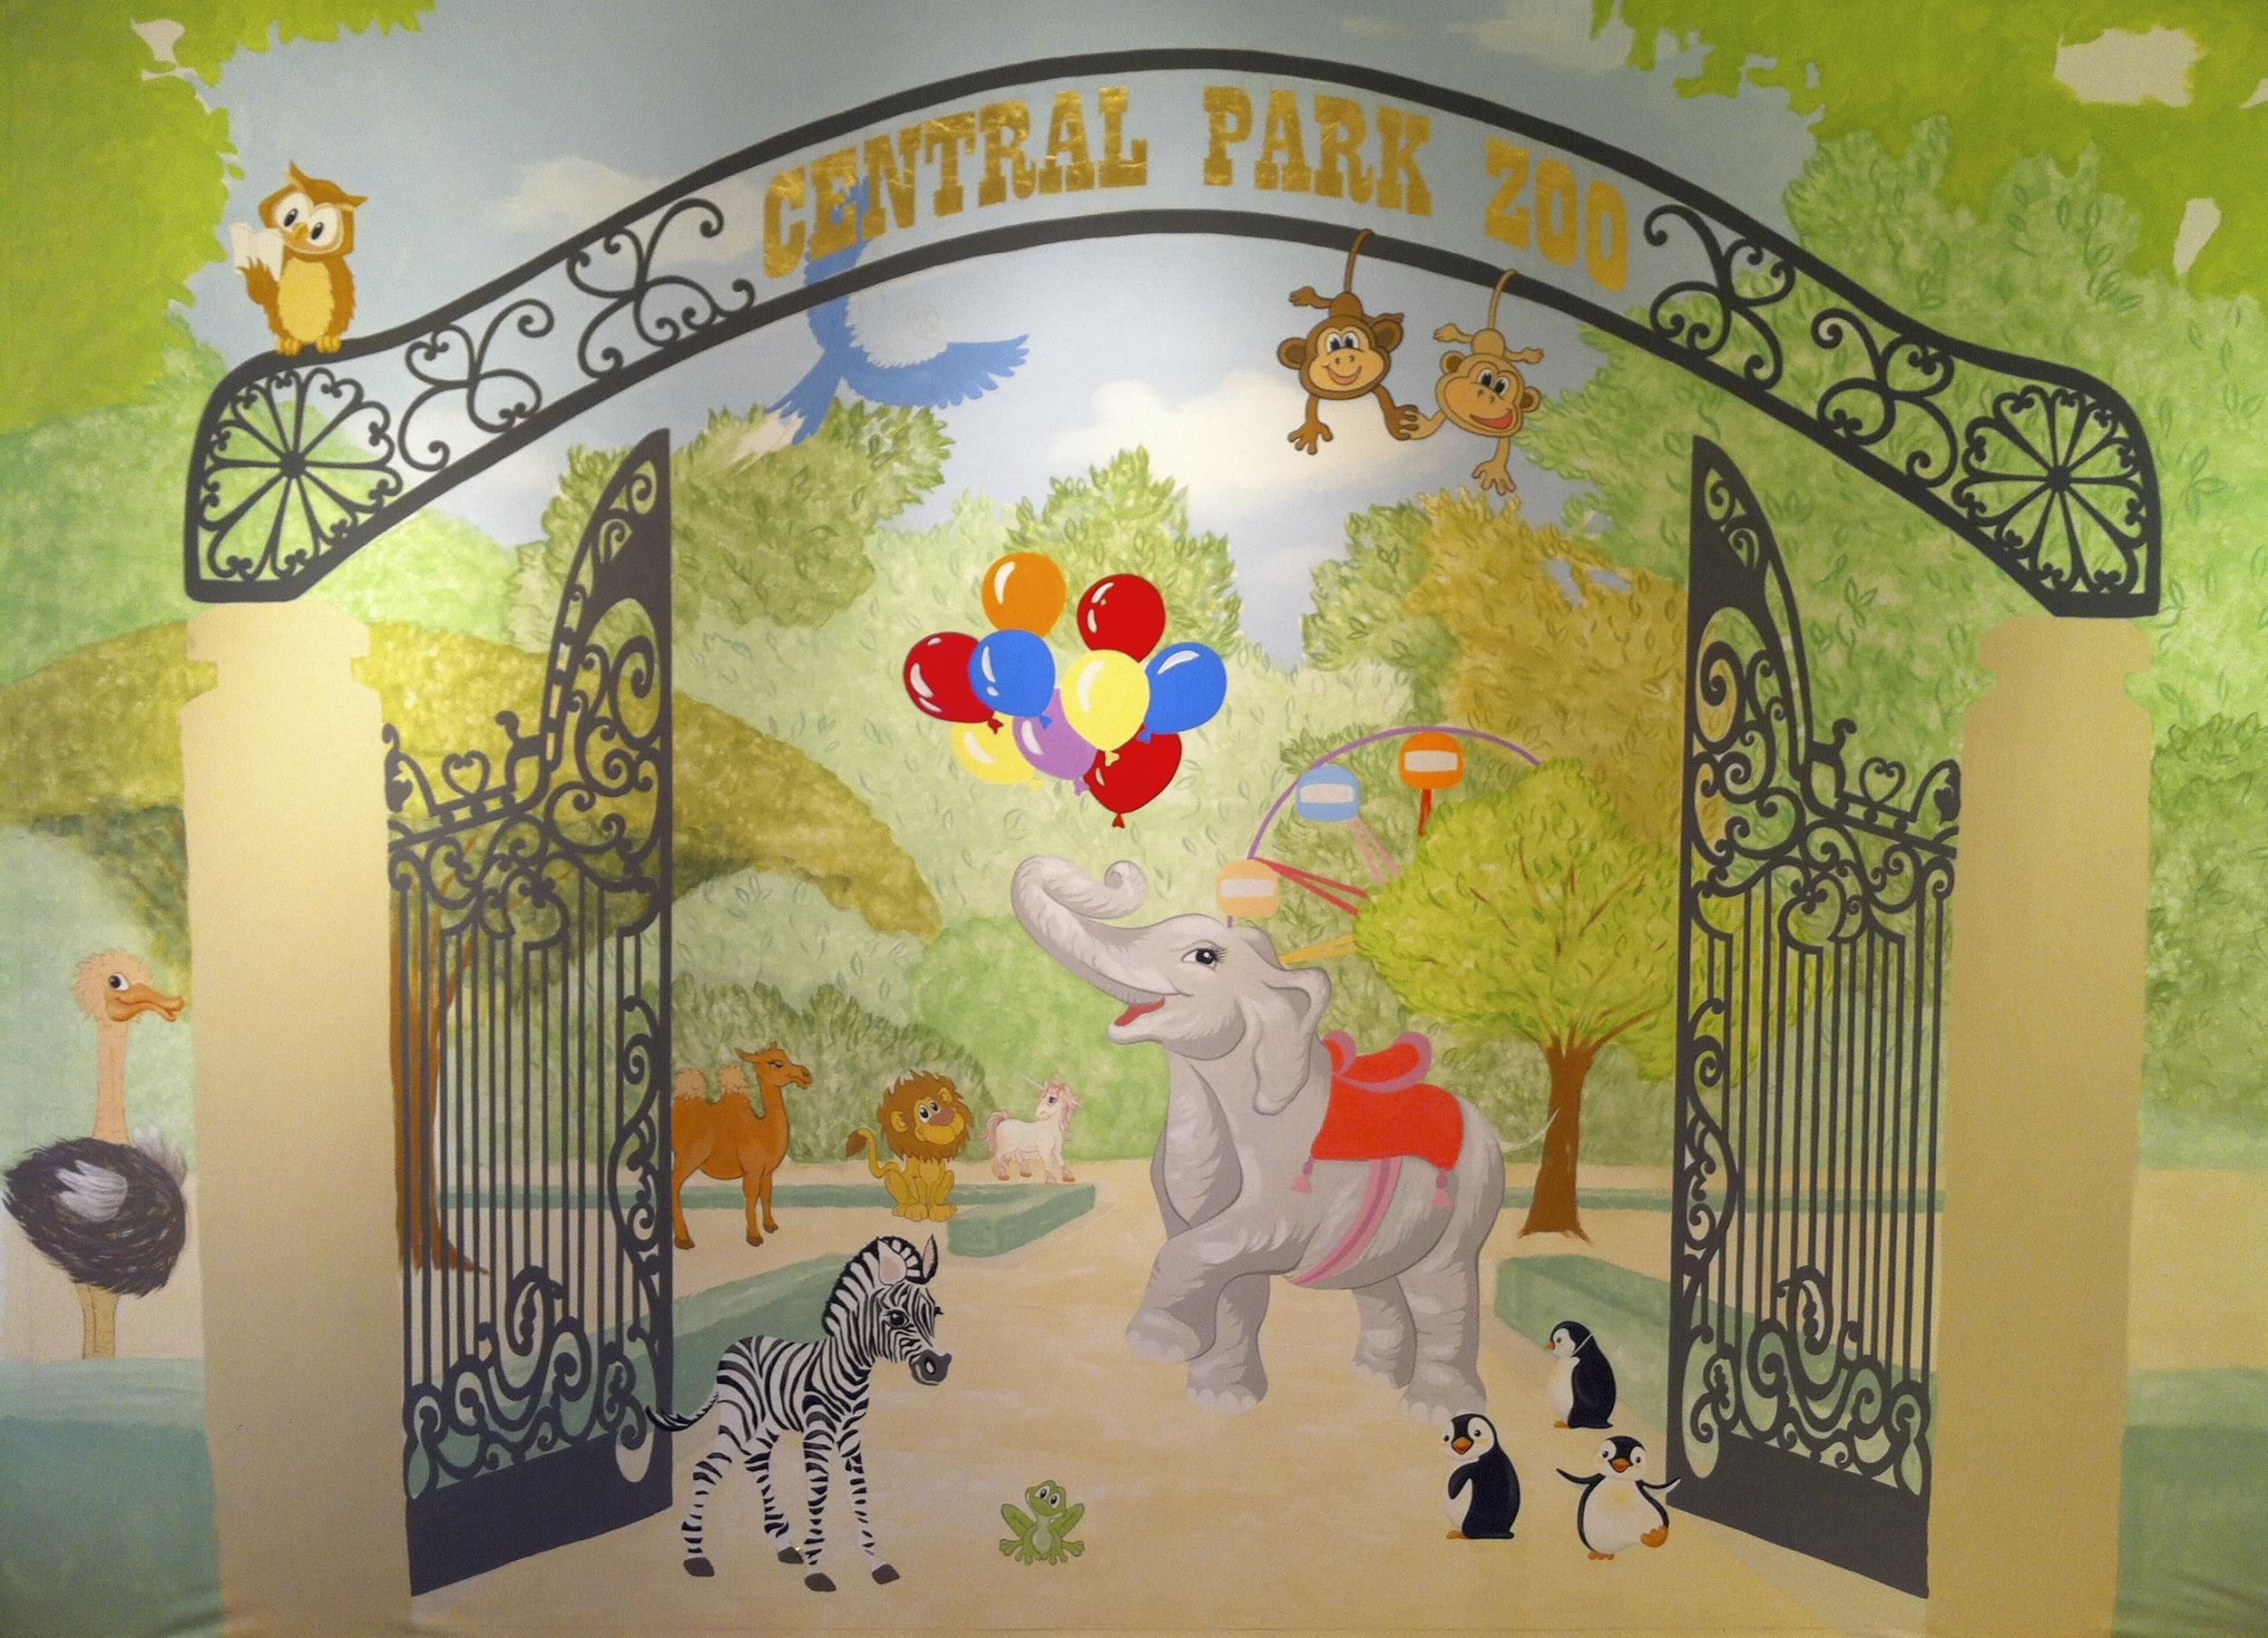 Central park mural.jpeg